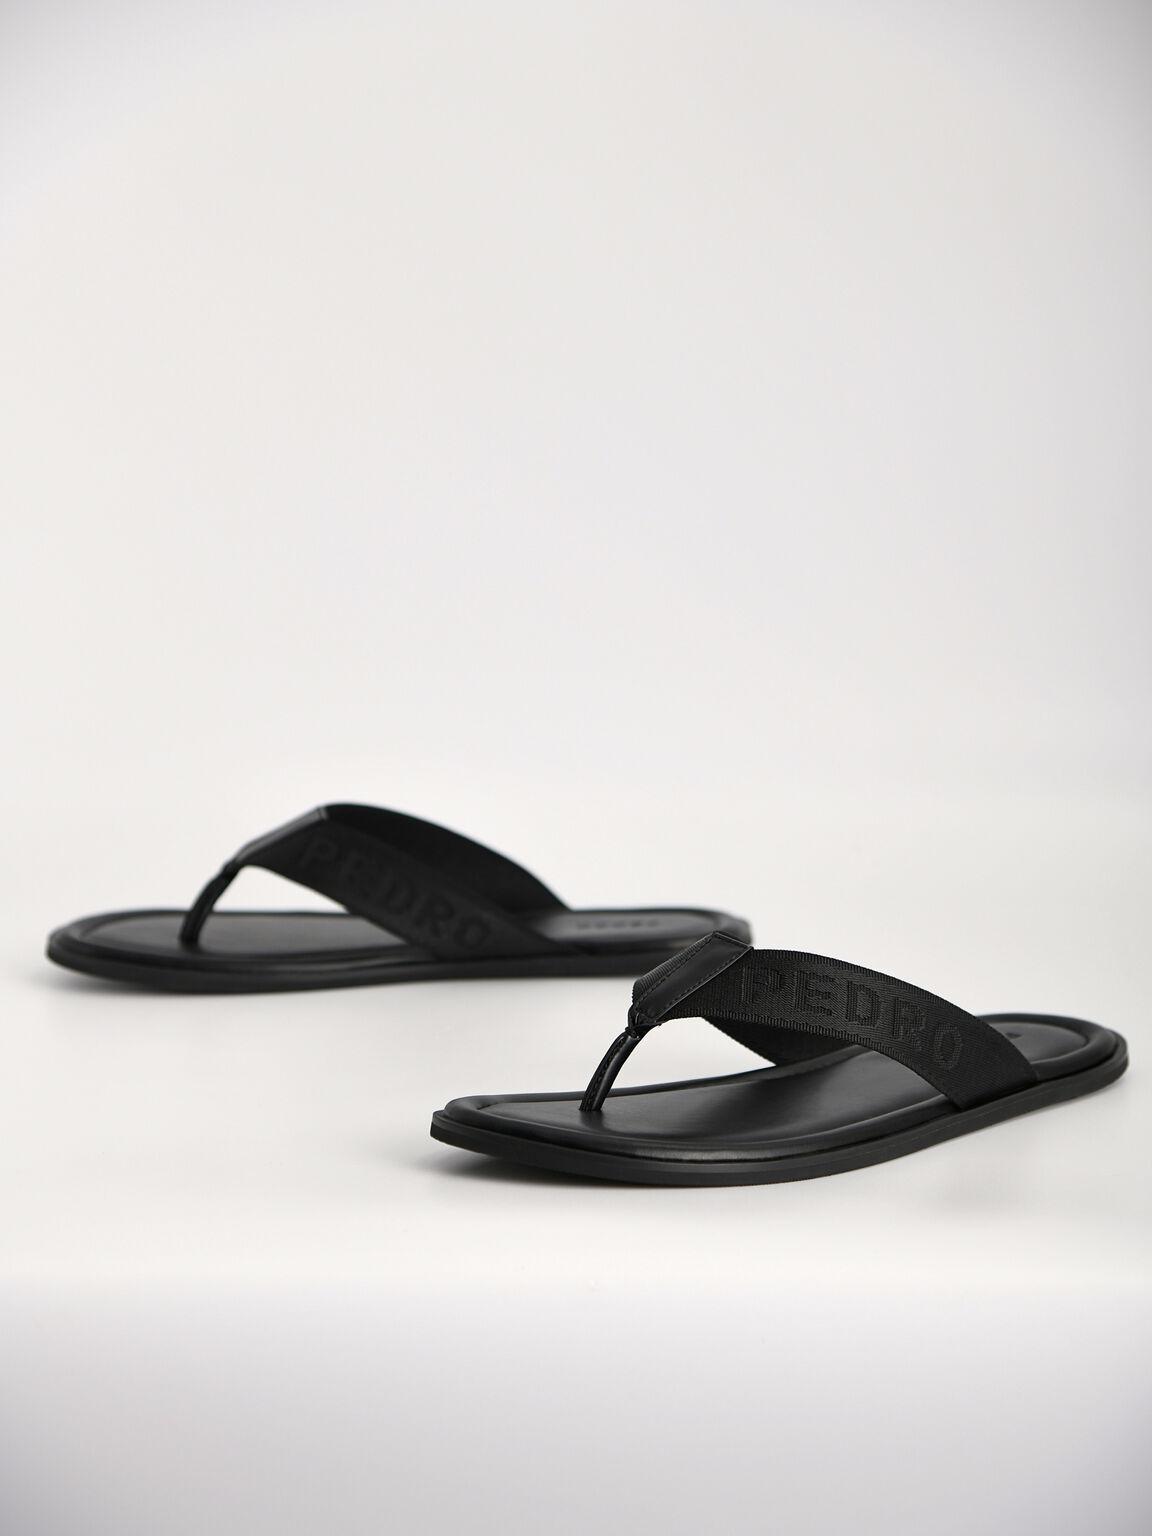 Nylon Thong Sandals, Black, hi-res